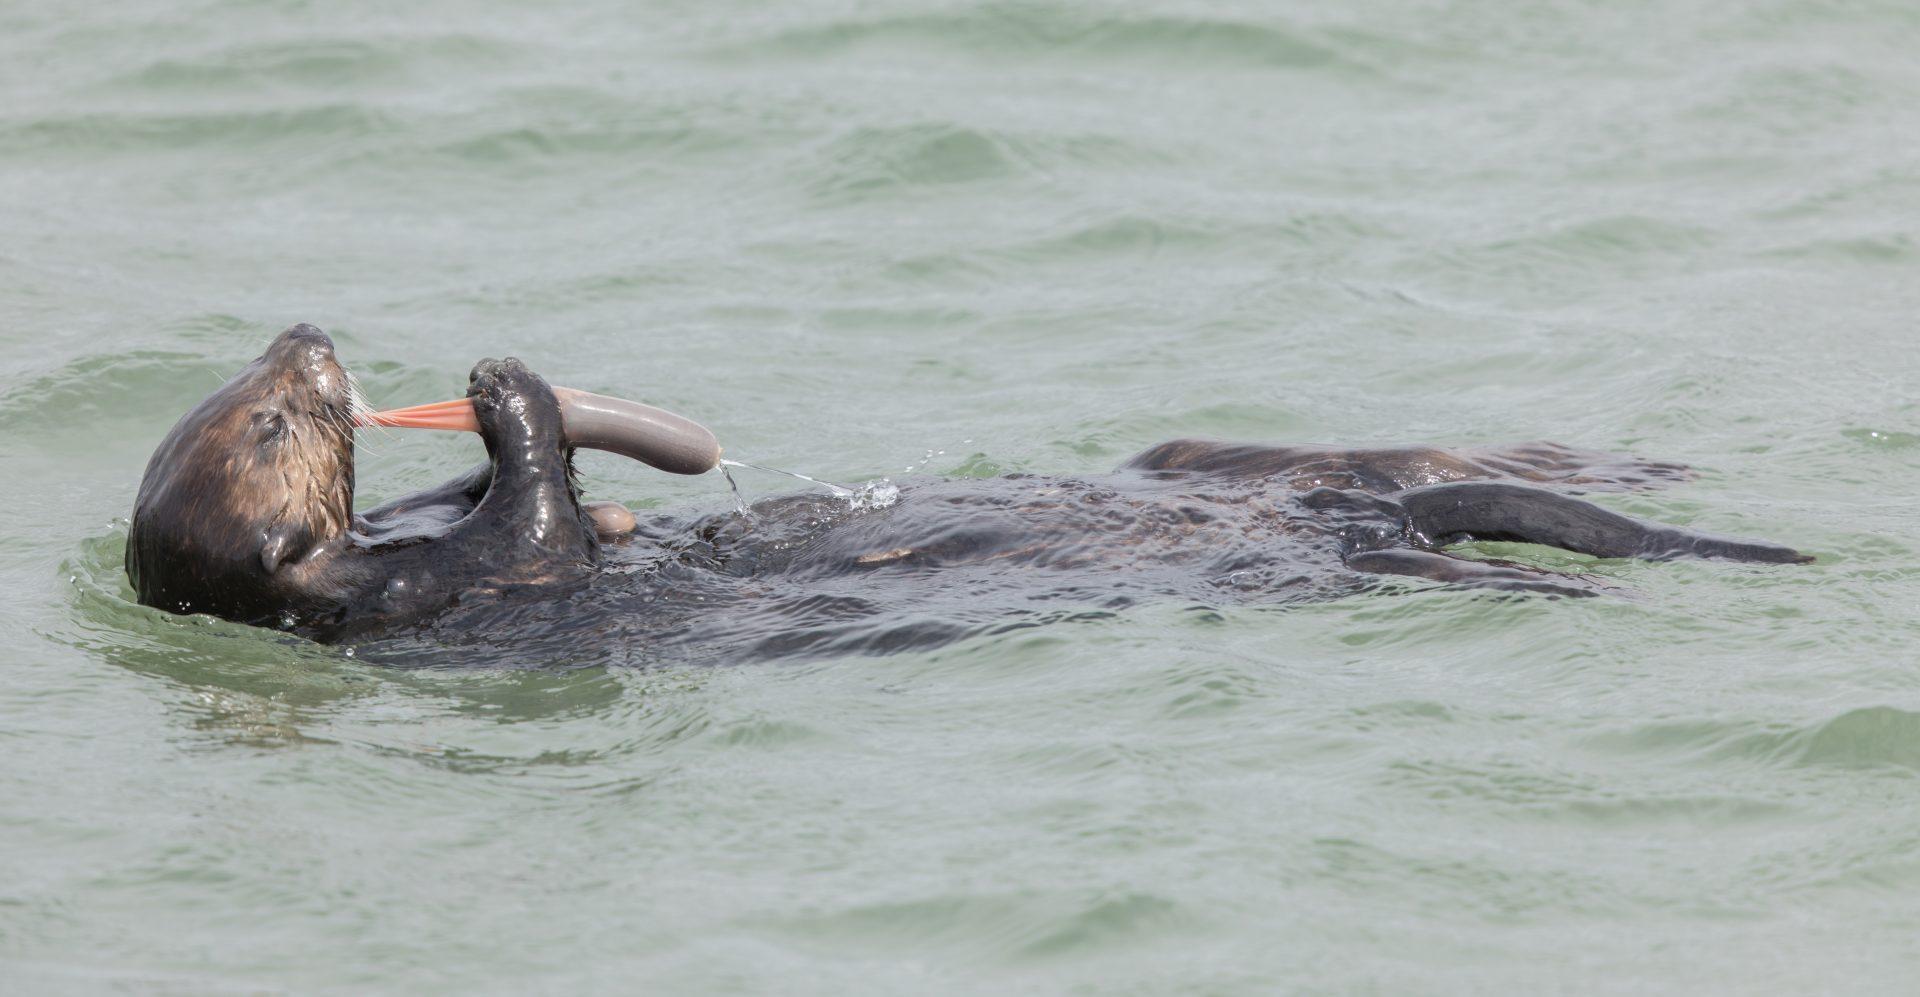 penis-fish-otter-eating